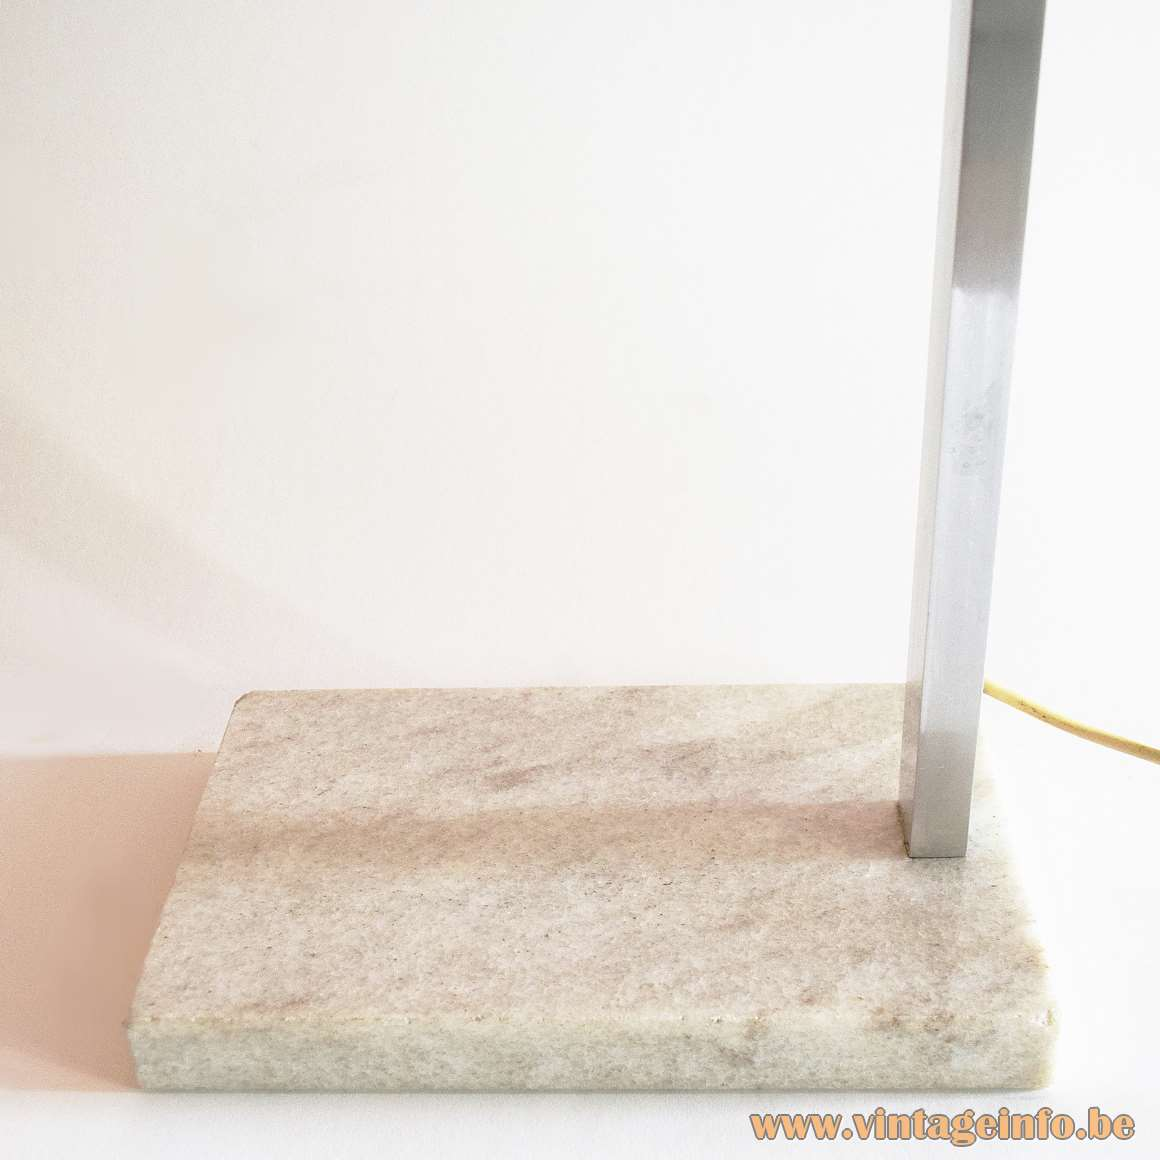 Acrylic Globe Floor Lamp - marble base